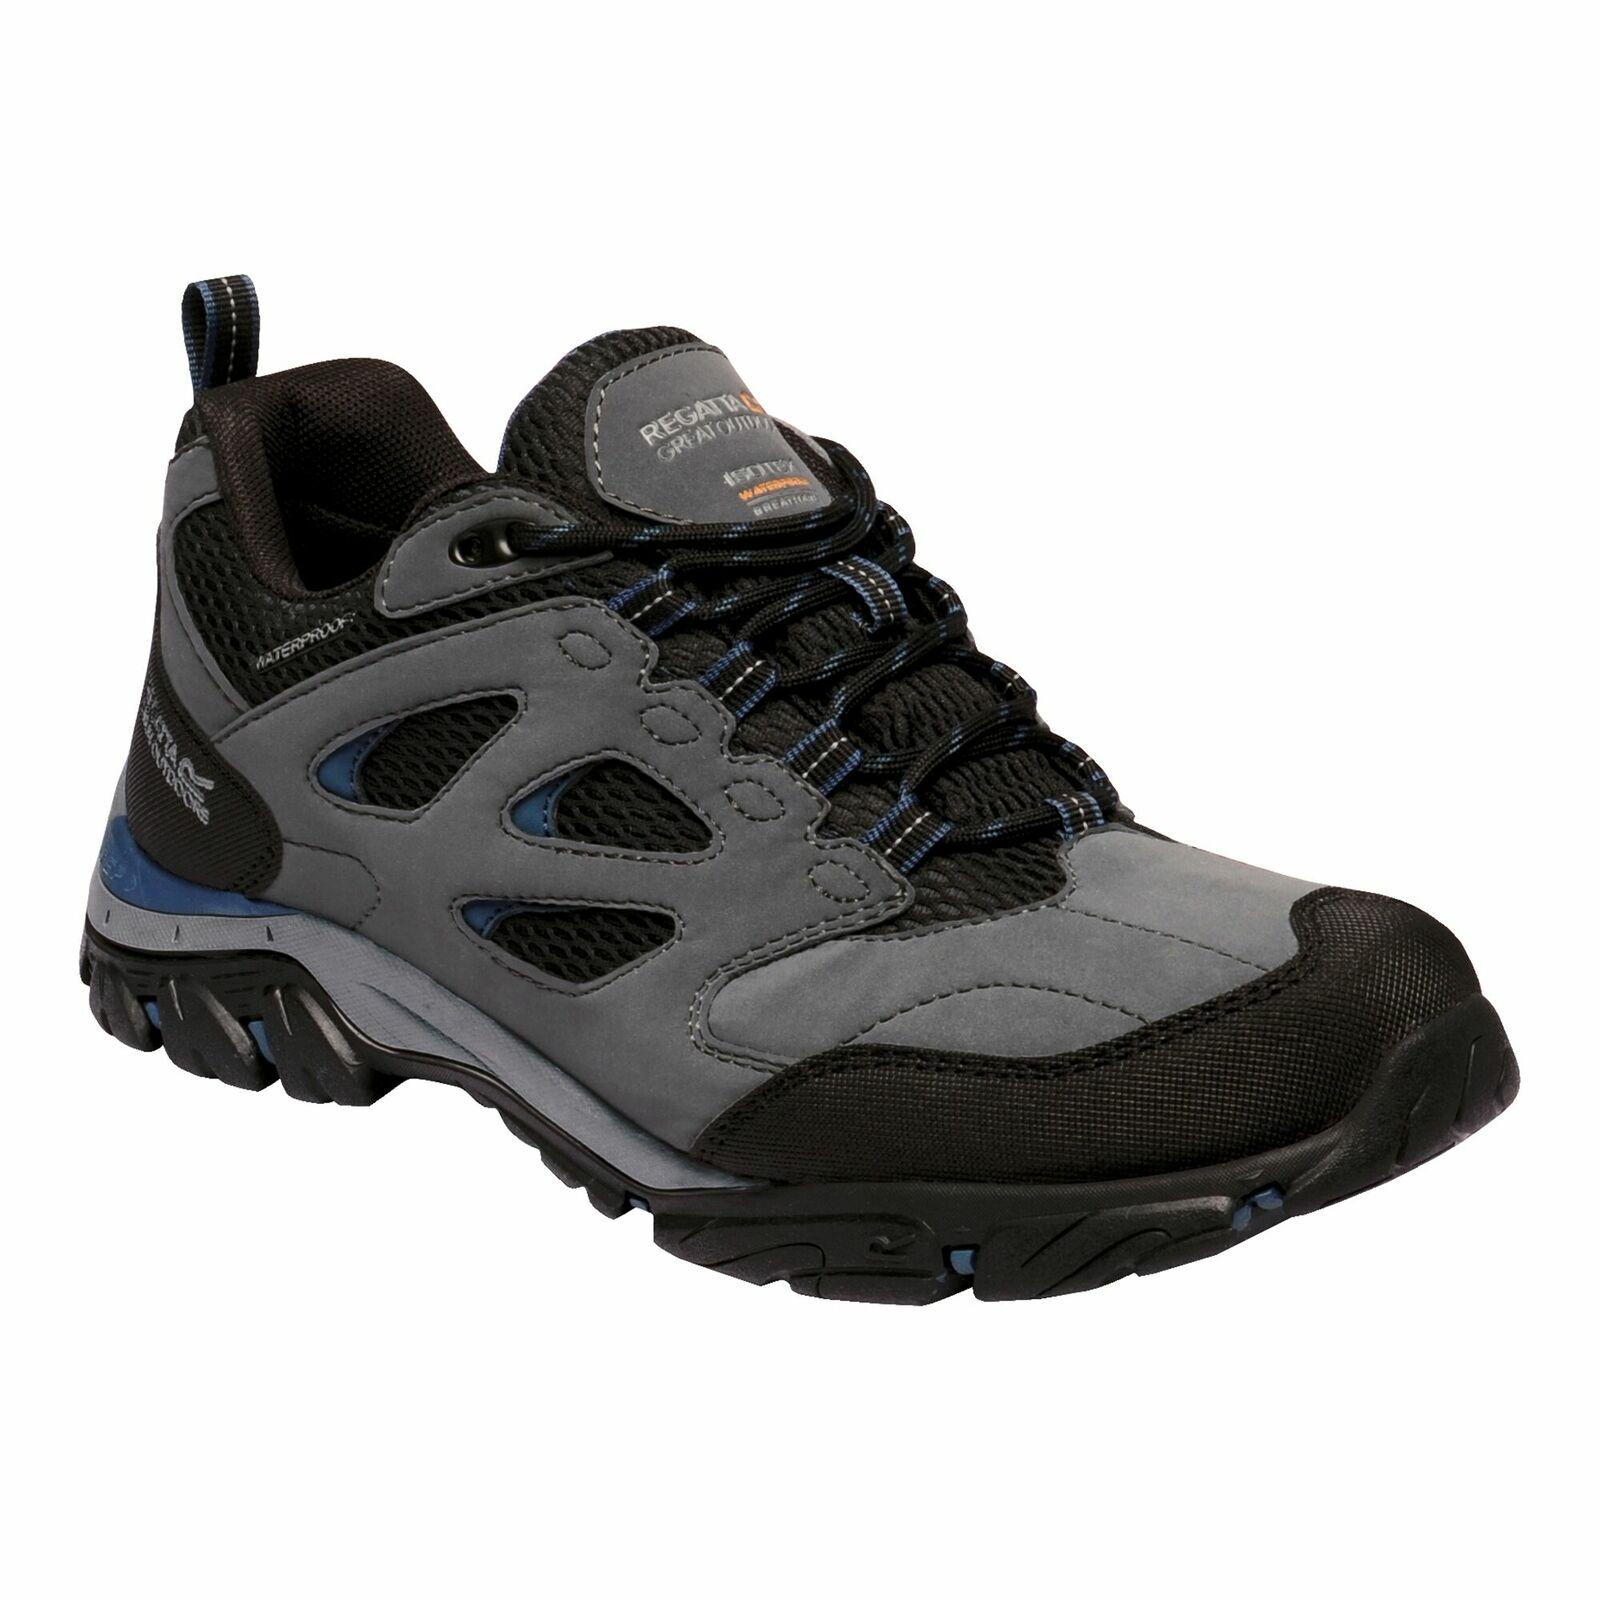 Regatta Men's Holcombe IEP Waterproof Low Hiking Shoes in granite / dark denim for £37.04 delivered using code @ eBay / Regatta